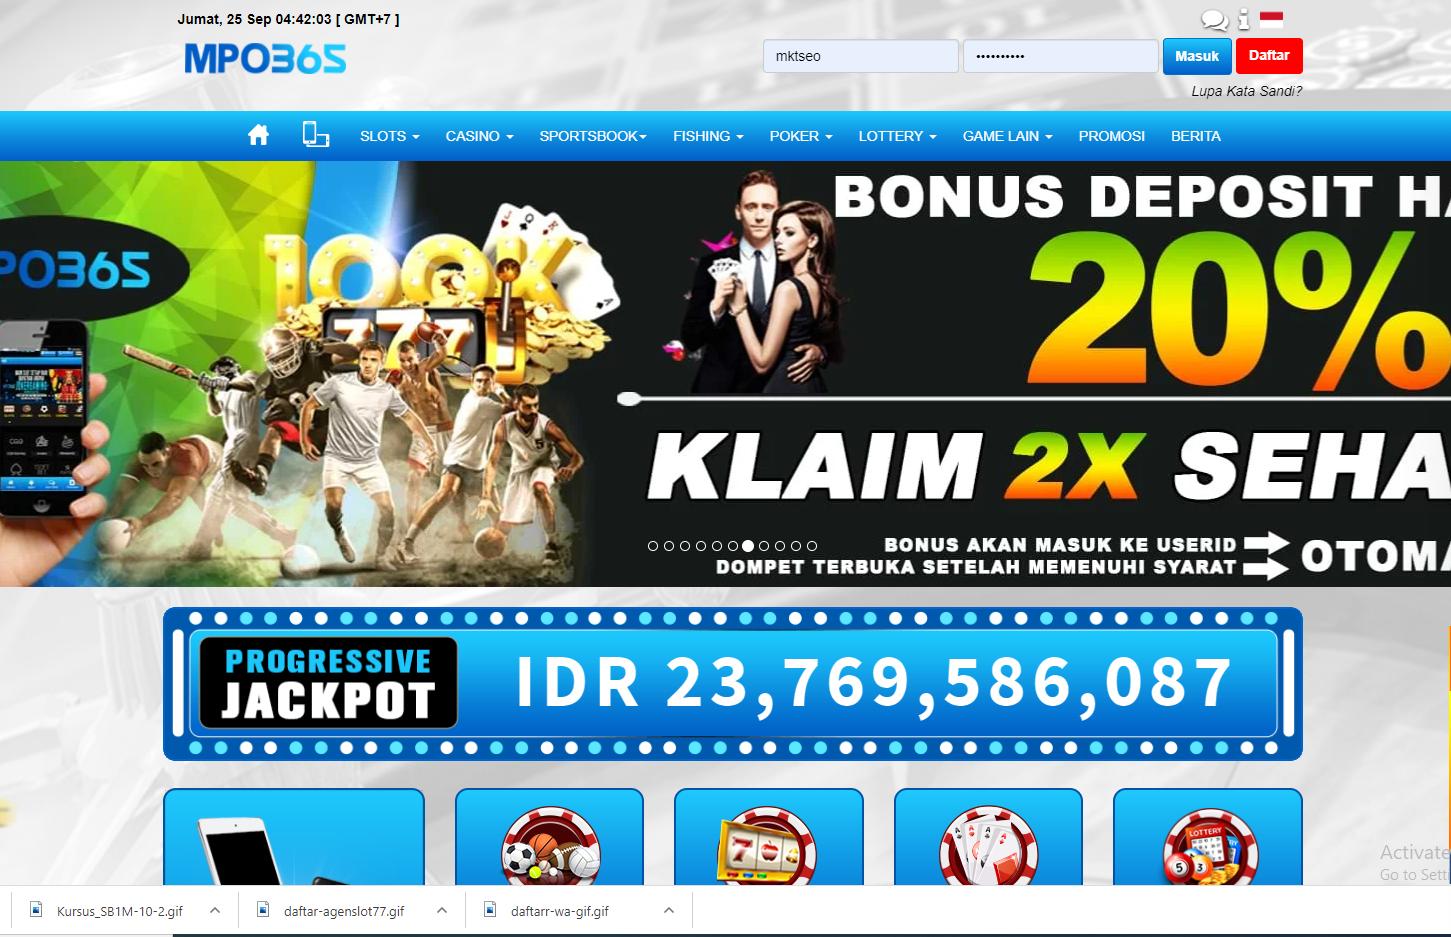 Aar 661 Mpo365 Agen Judi Casino Online Gameplay Asf Jira